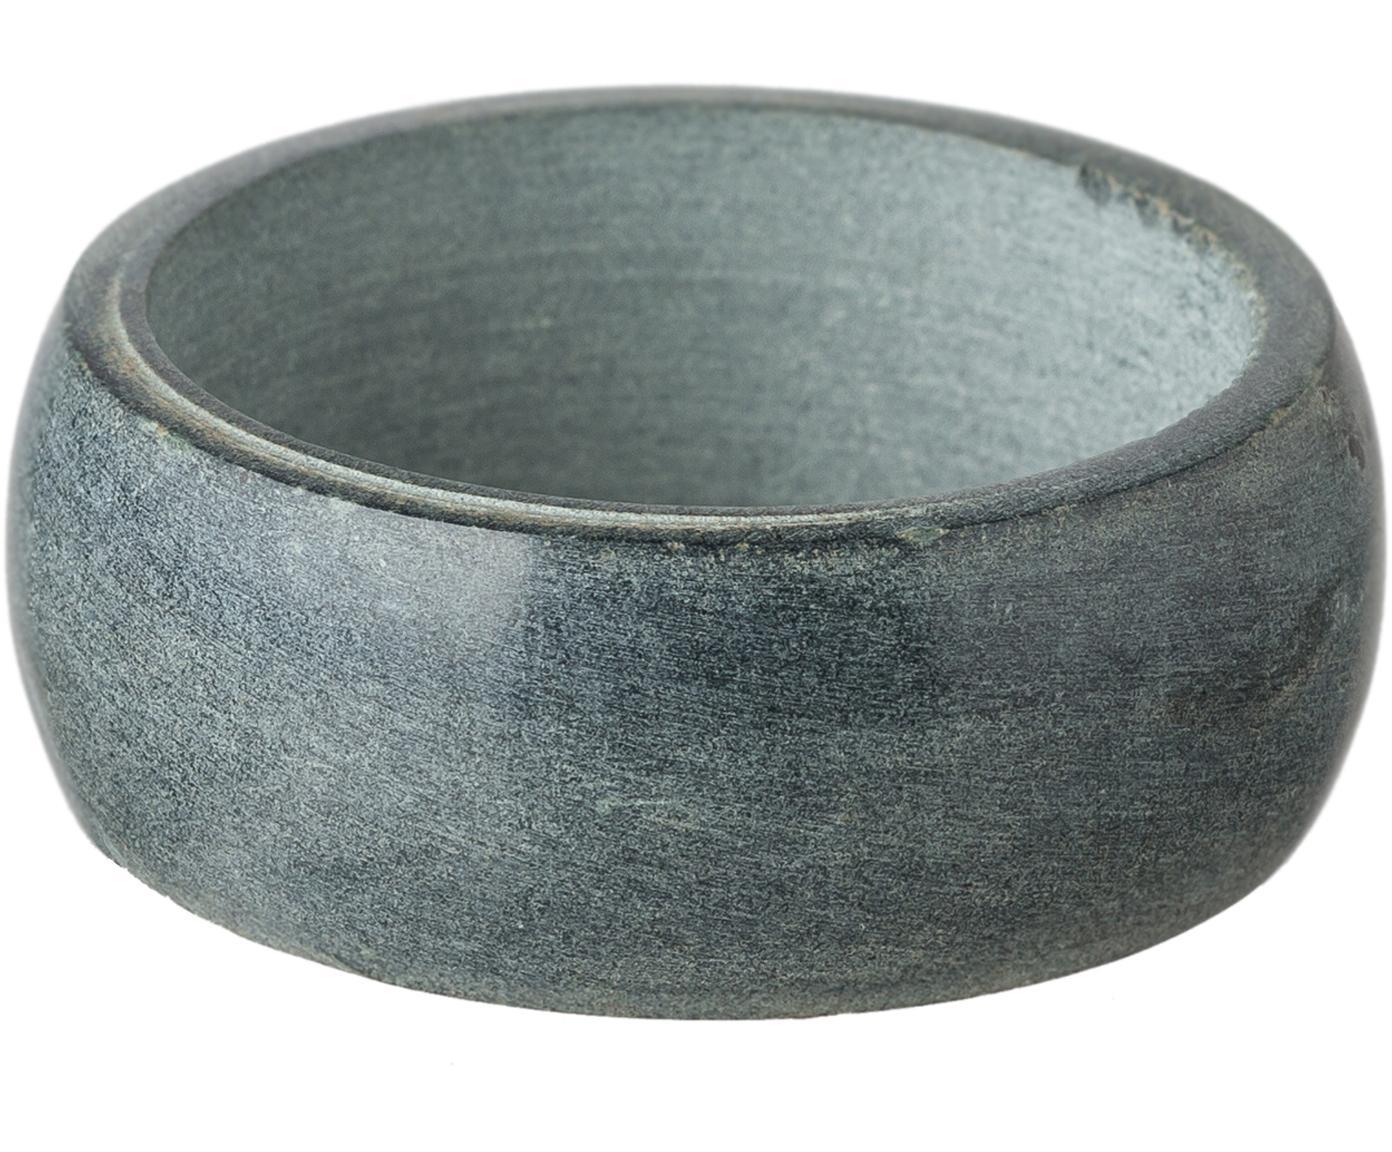 Servetringen Soap Stone, 6 stuks, Zeepsteen, Antraciet, Ø 5 x H 2 cm